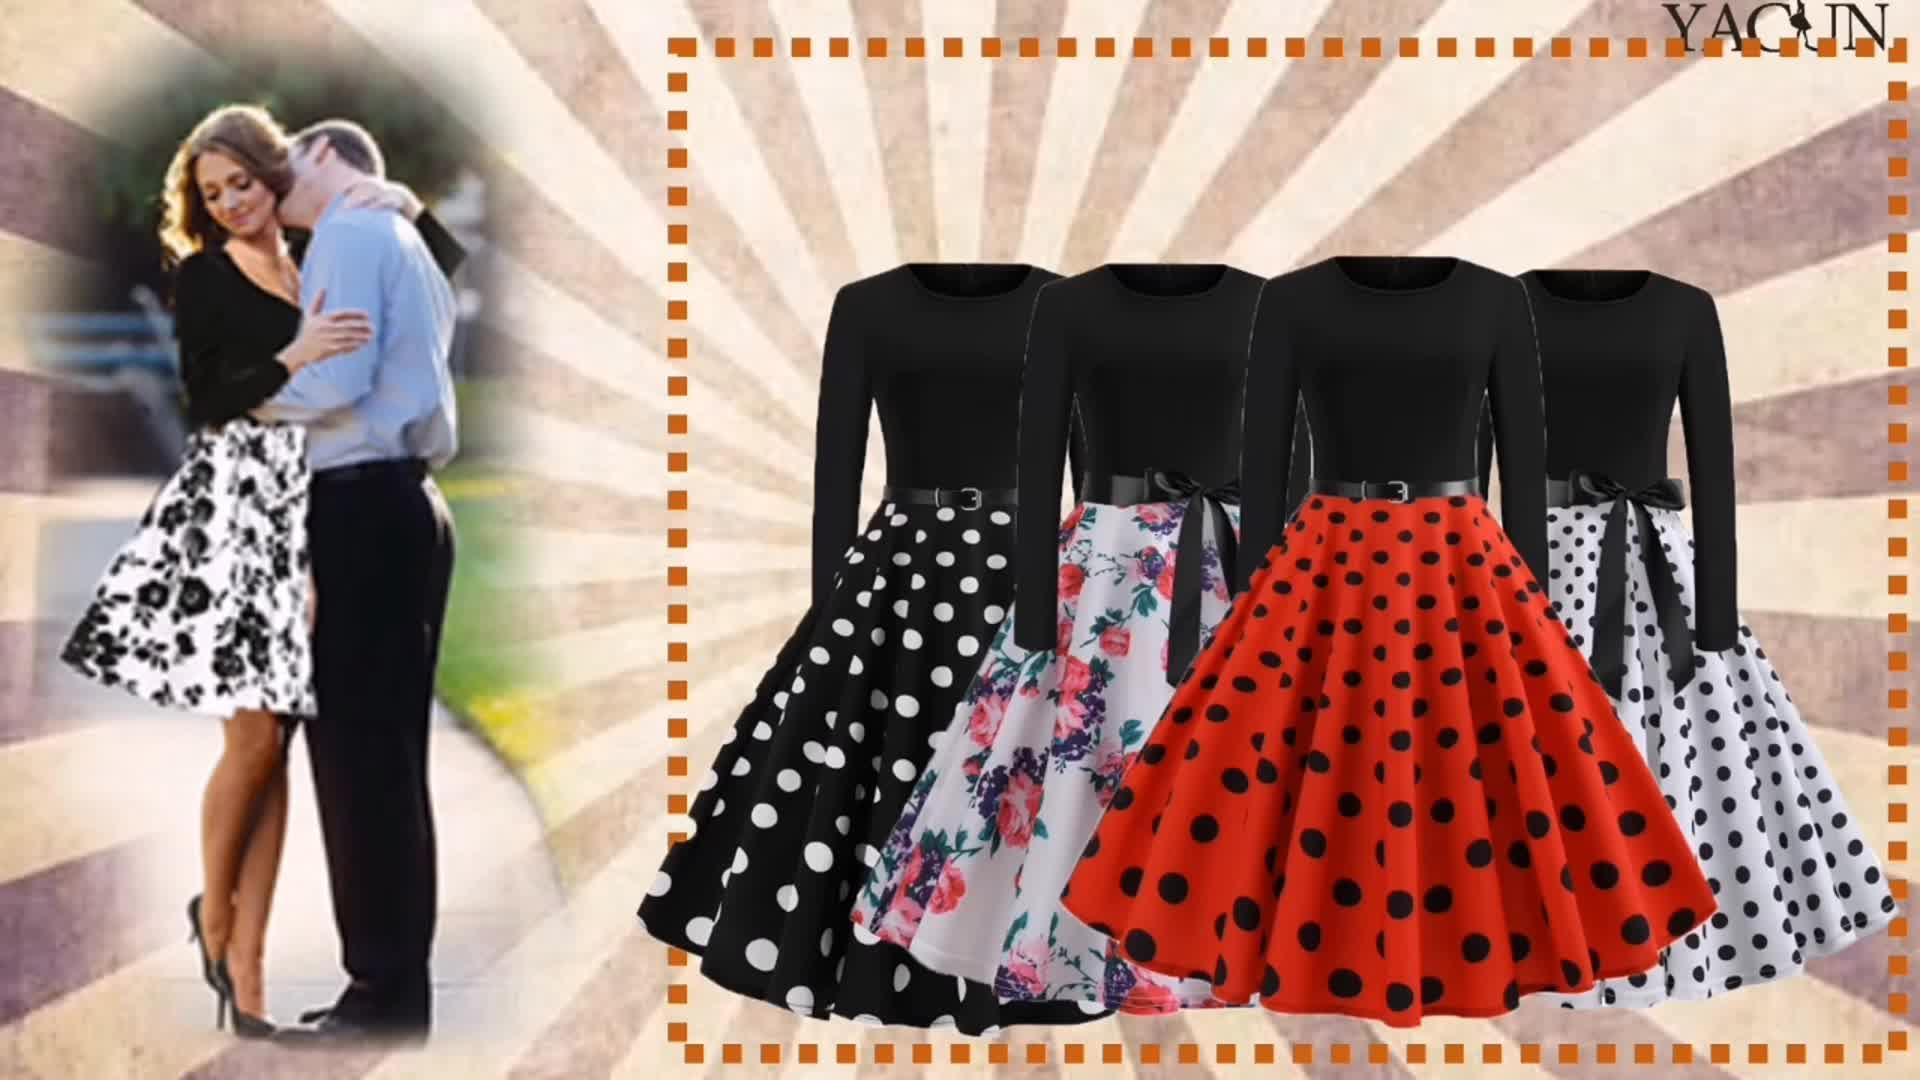 2020 Musim Panas Kerah Bulat Floral Cetak Long Sleeve 50 S Wanita Vintage Gaun